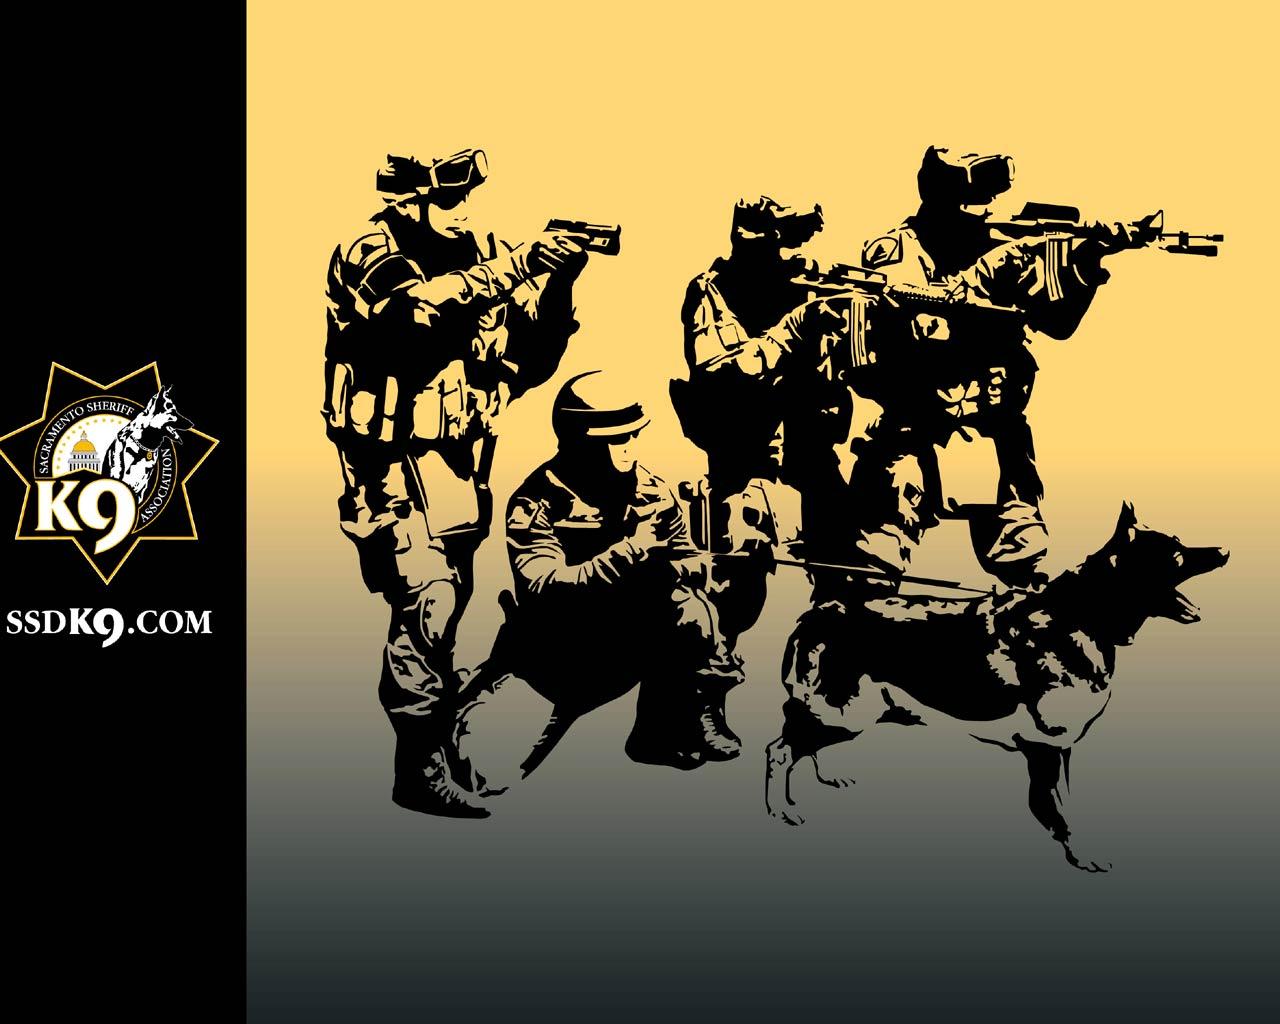 Swat Team Wallpapers 1280x1024